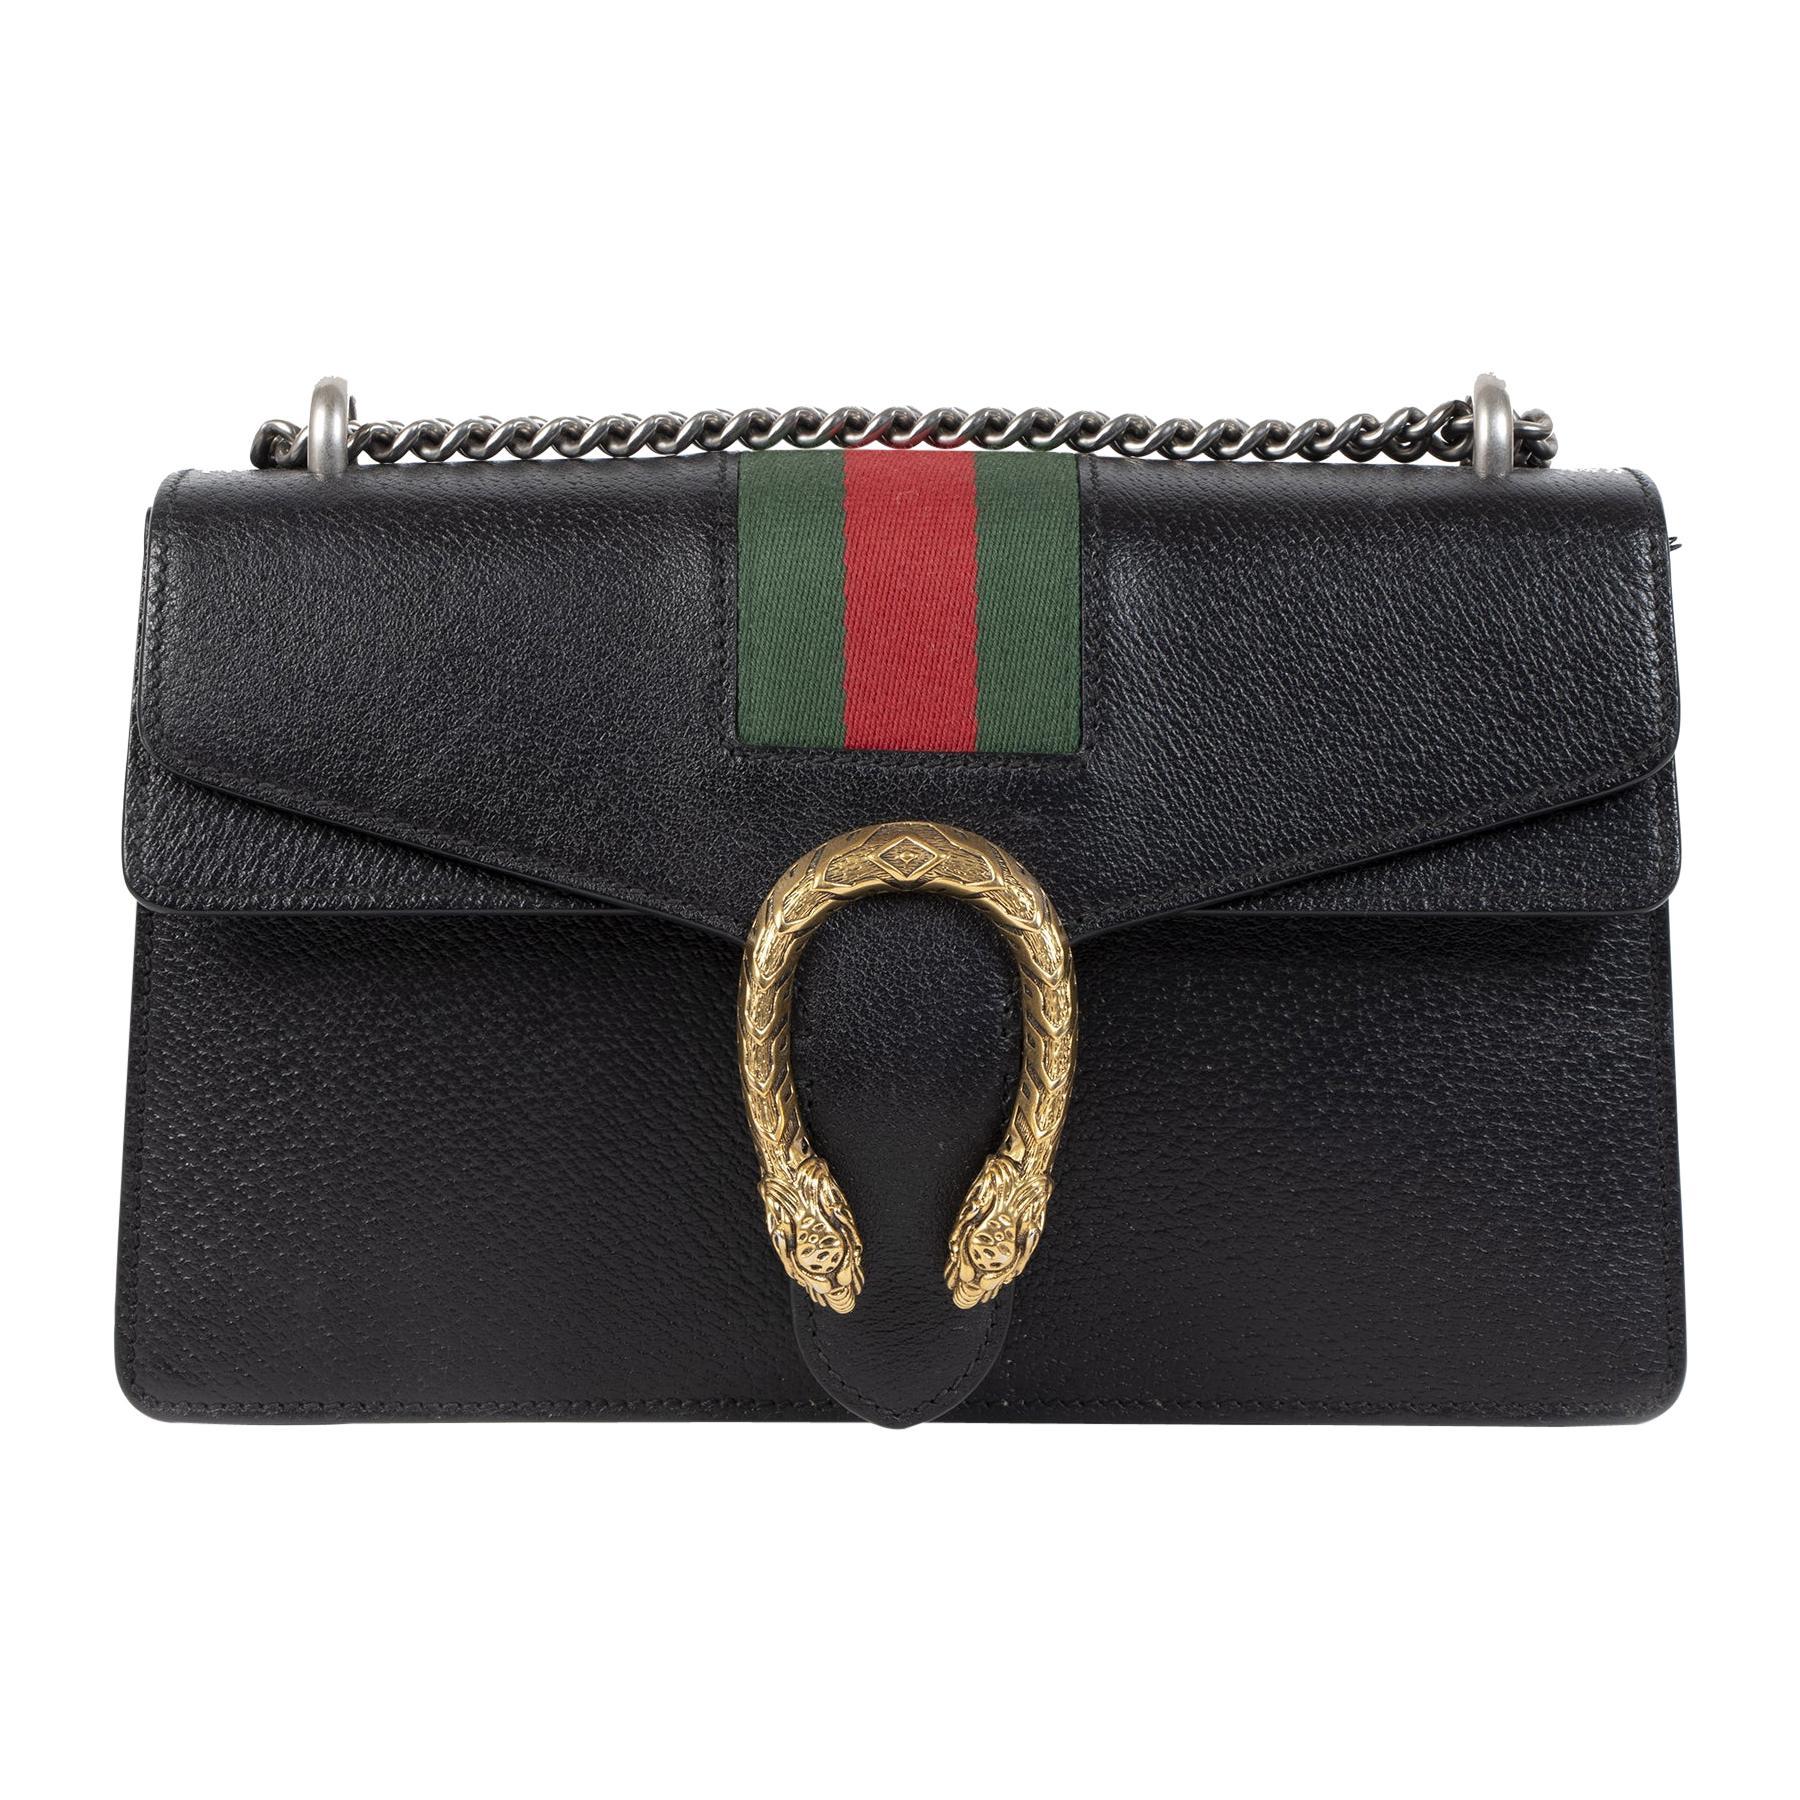 Gucci Diyonisus Web Black Shoulder Bag